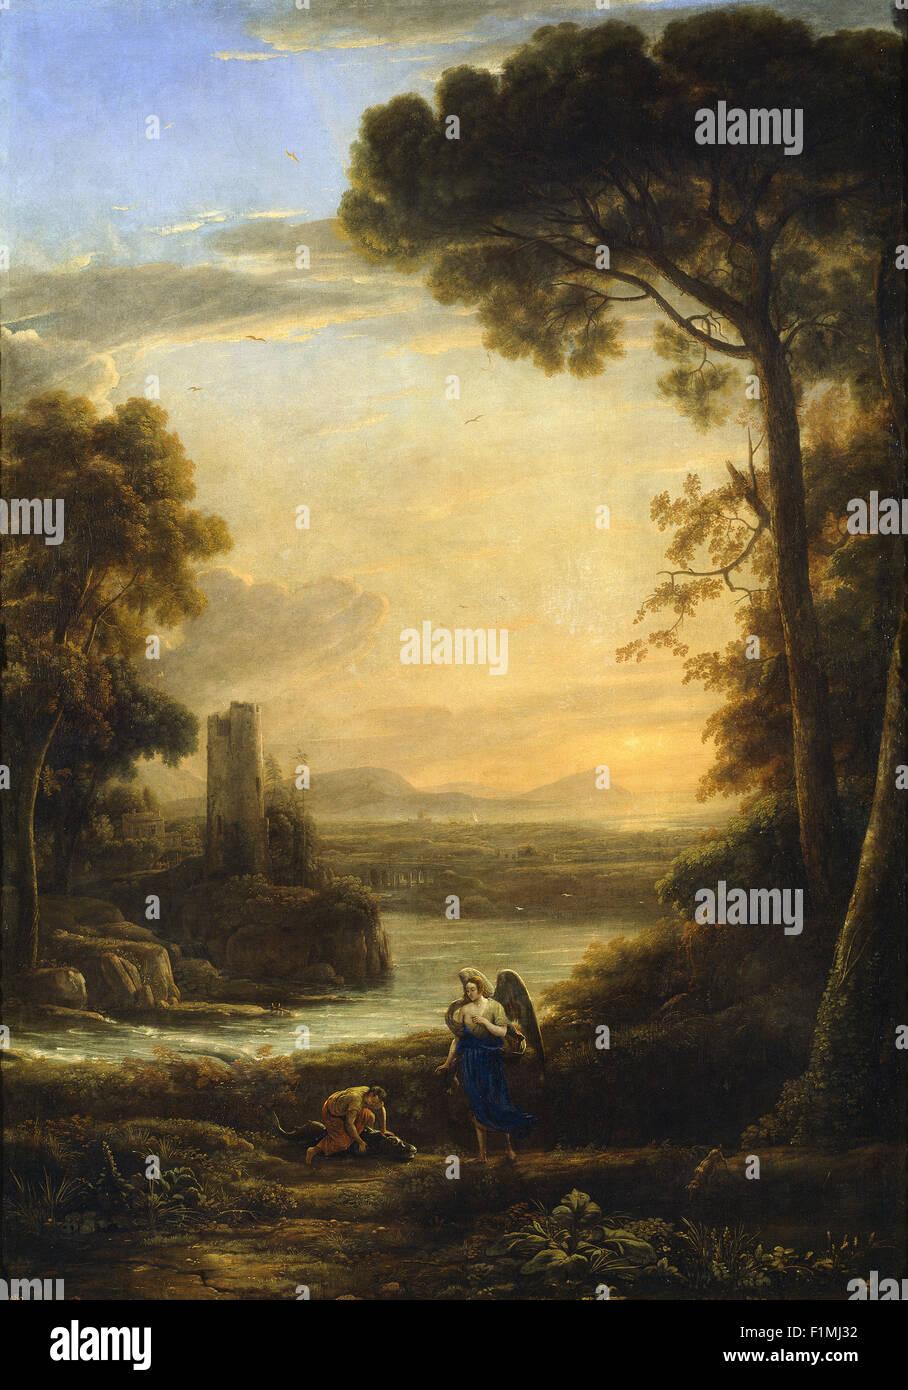 Claude Lorrain (Claude Gellée) - The Archangel Raphael and Tobias - Stock Image